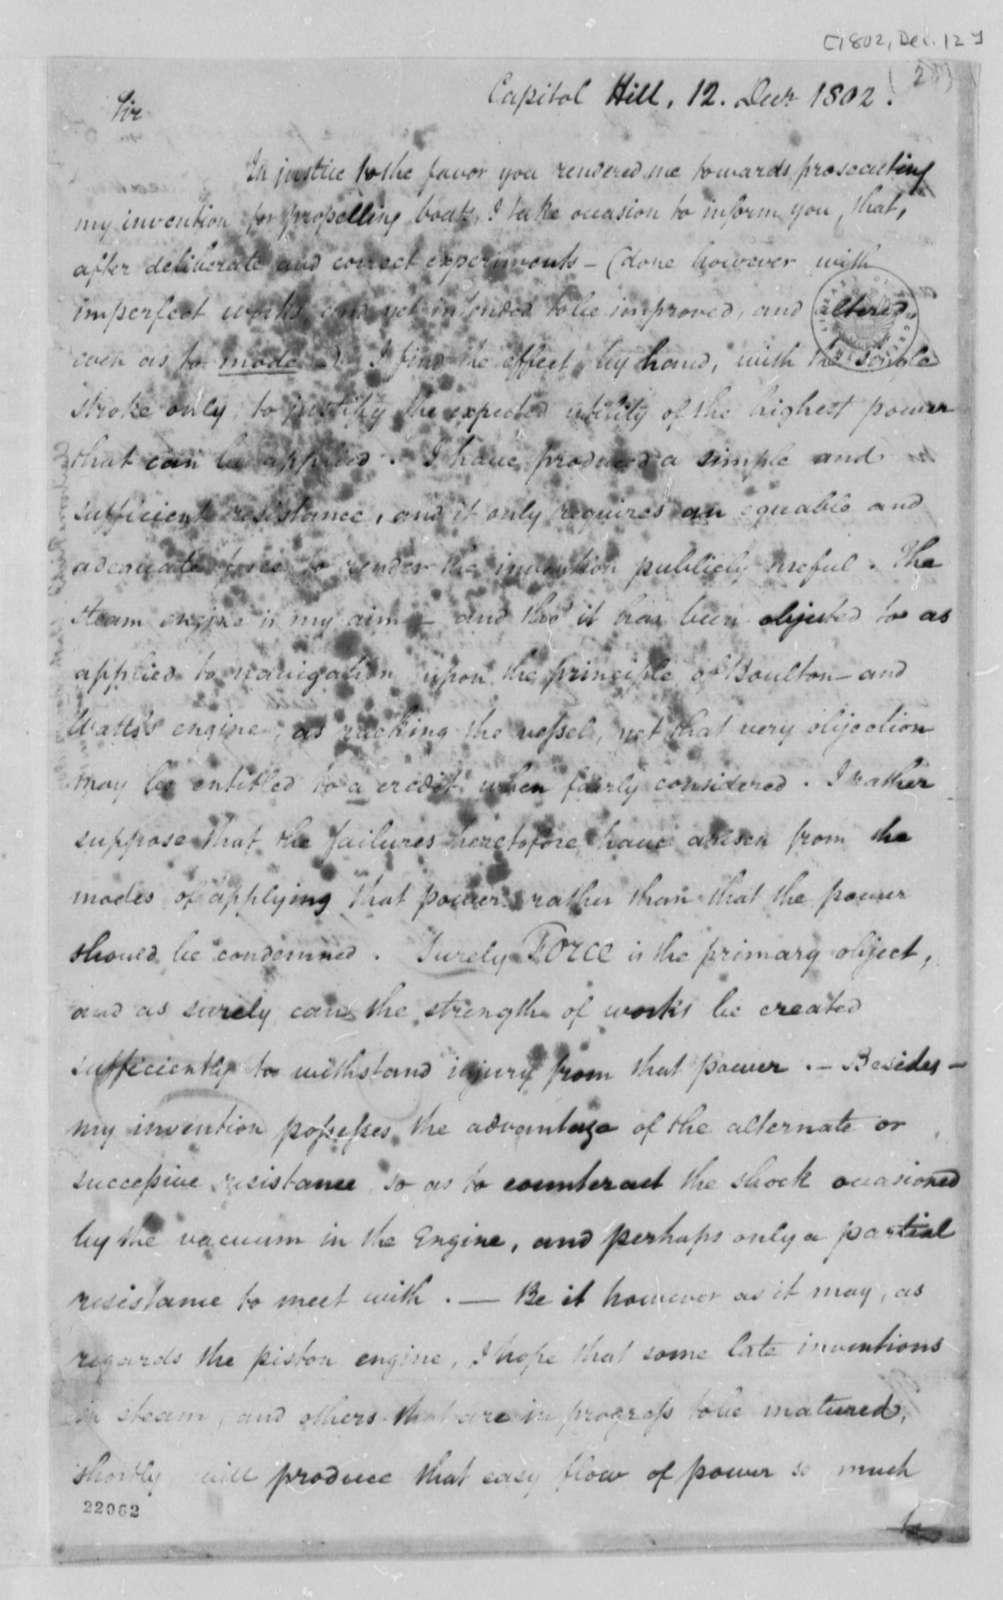 Richard Claiborne to Thomas Jefferson, December 12, 1802